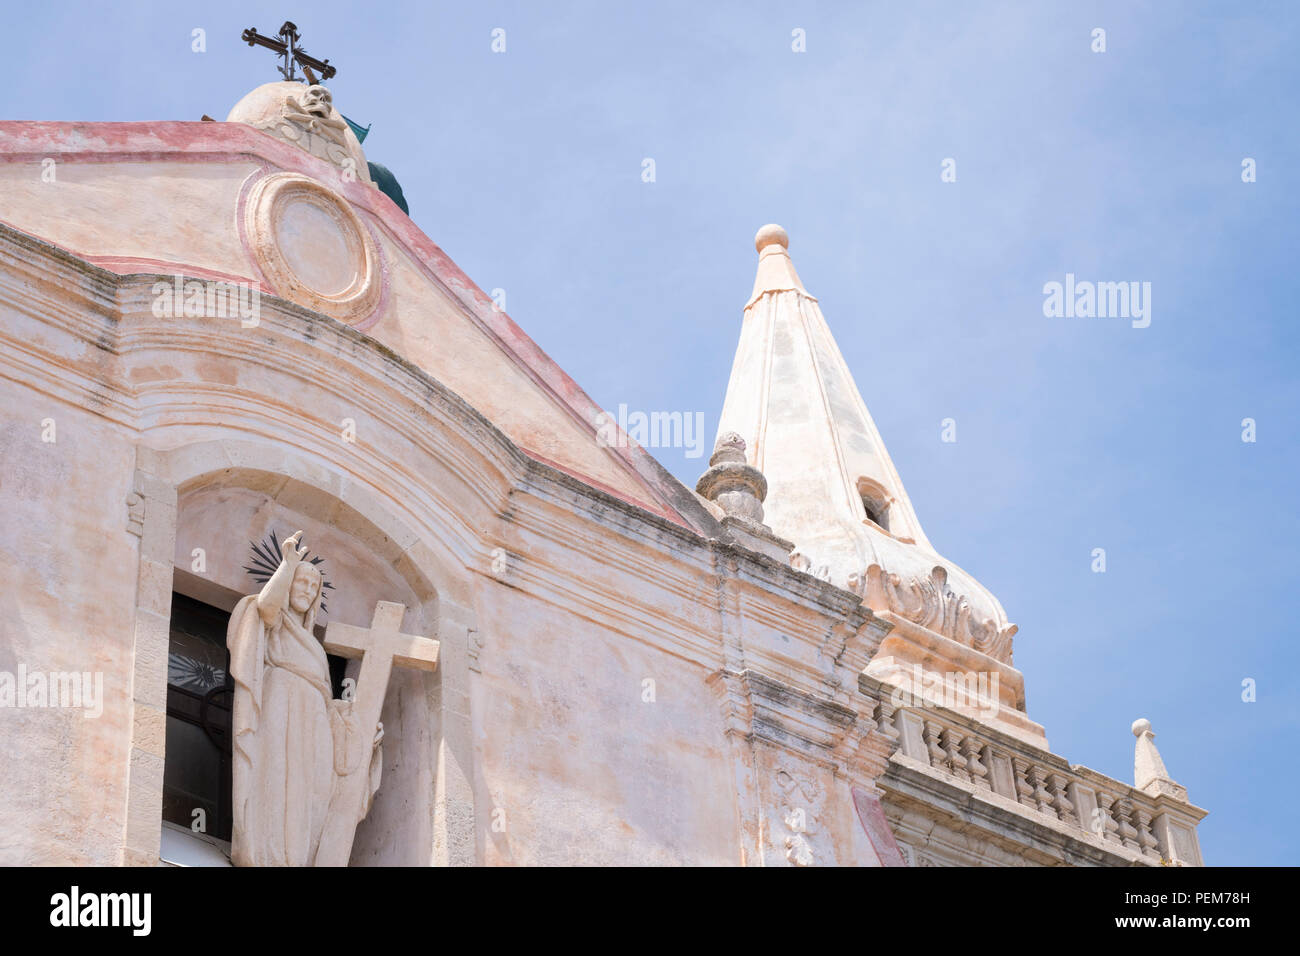 Italy Sicily Monte Tauro famous luxury tourist resort Taormina detail Church Chiesa di San Giuseppe statue sculpture under renovation - Stock Image